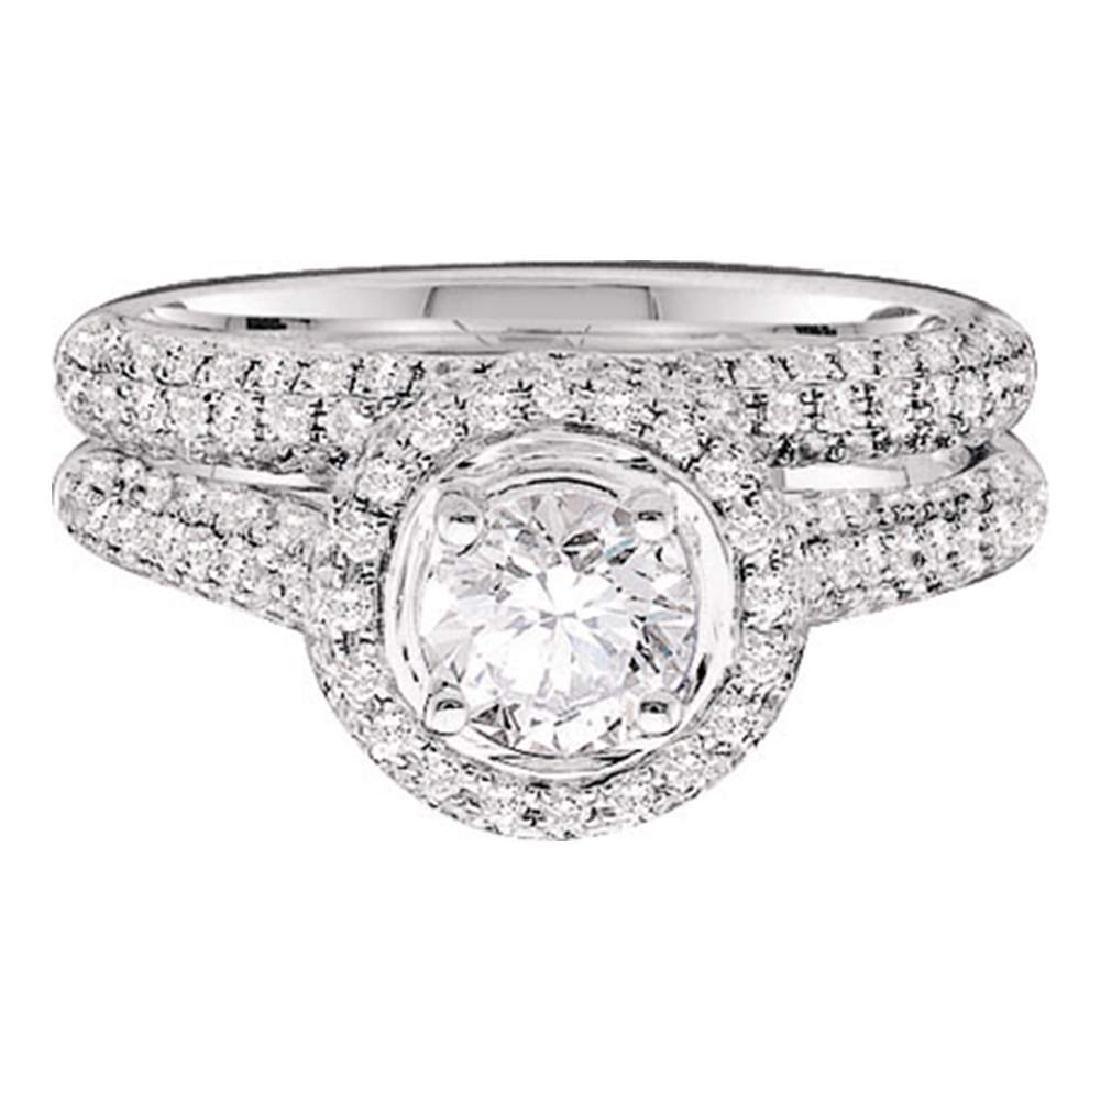 1.25 CTW Diamond Bridal Wedding Engagement Ring 14KT